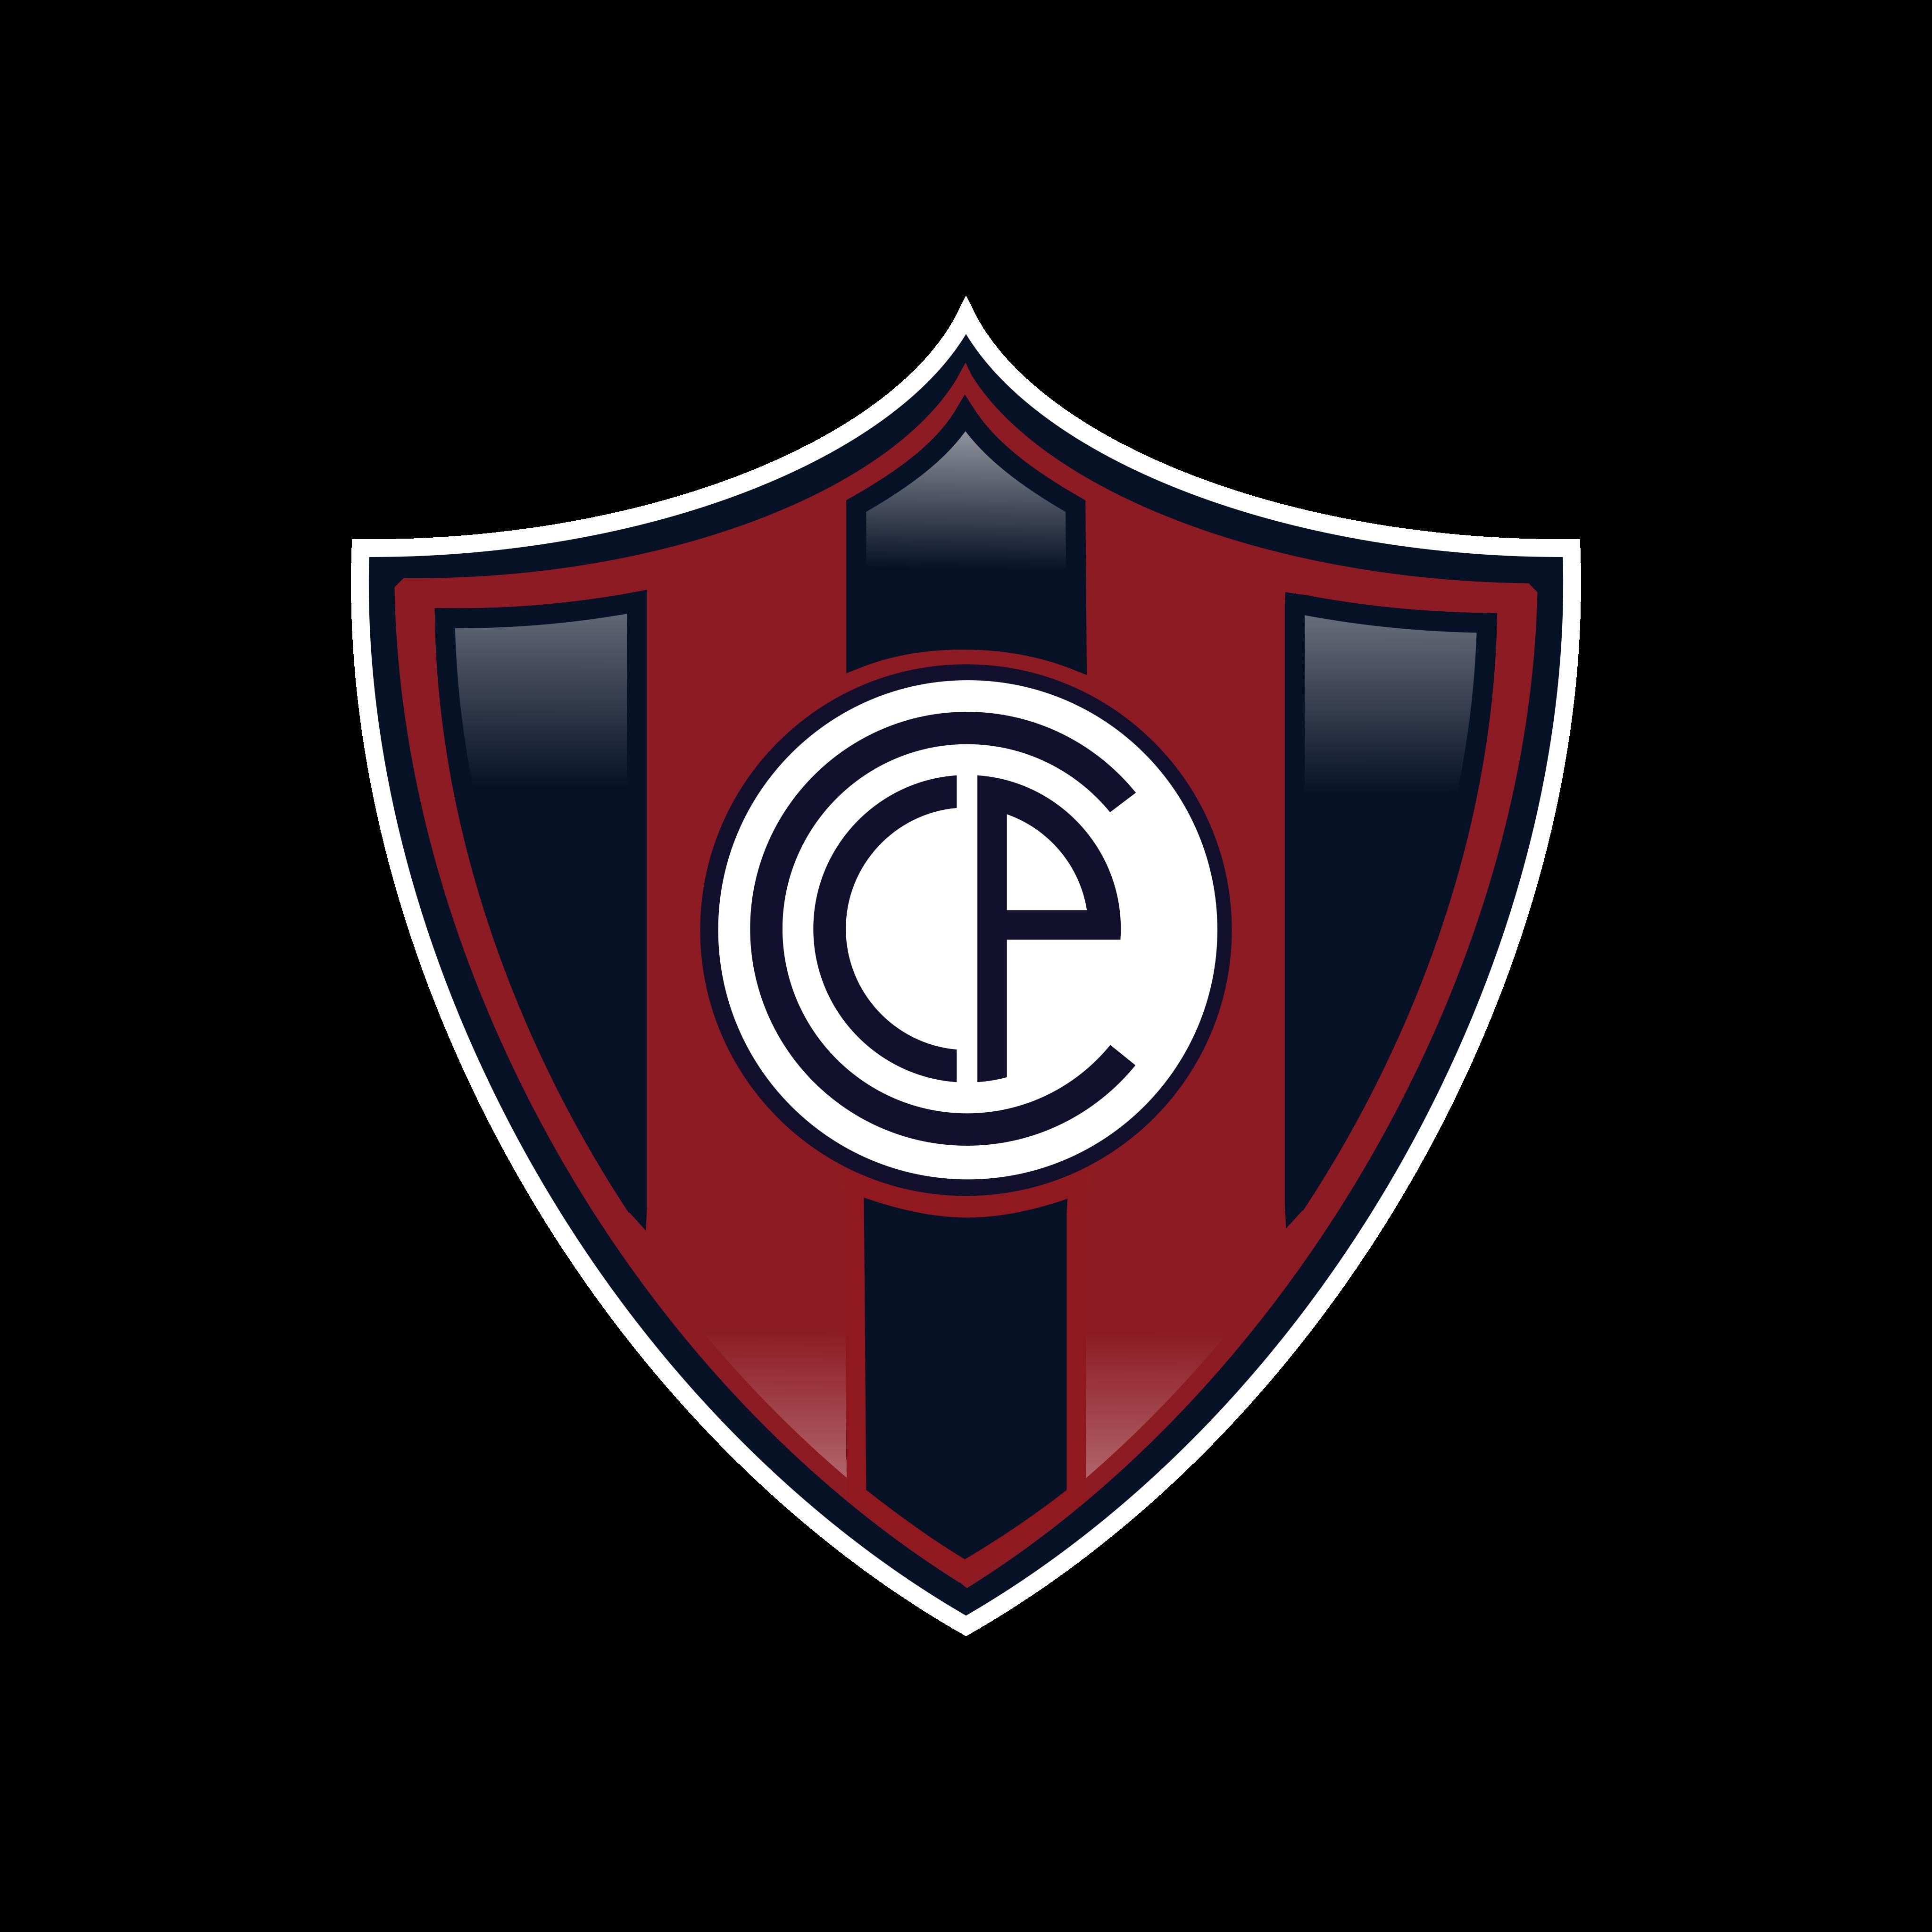 cerro porteno logo 0 - Cerro Porteño Logo - Escudo